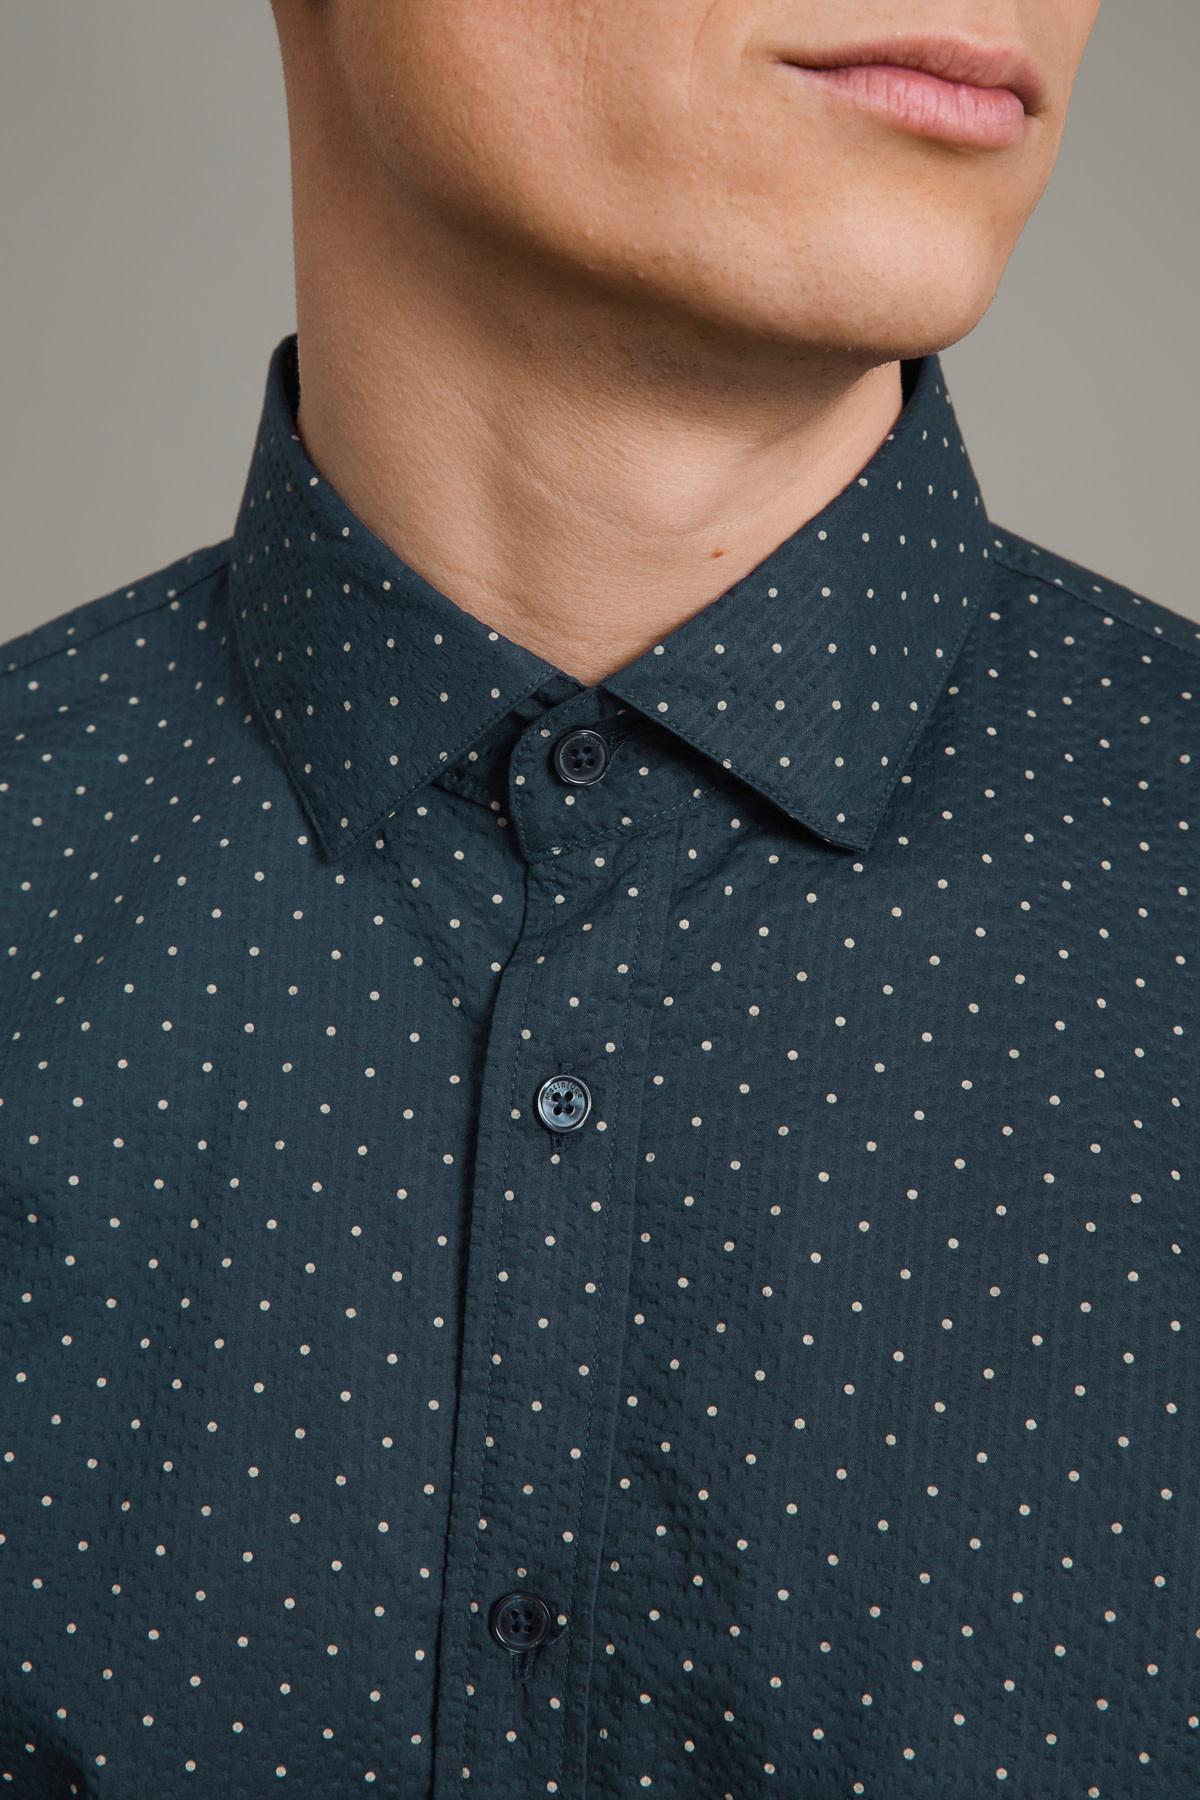 Trostol Short Sleeve Dress Shirt - Dark Navy Dot